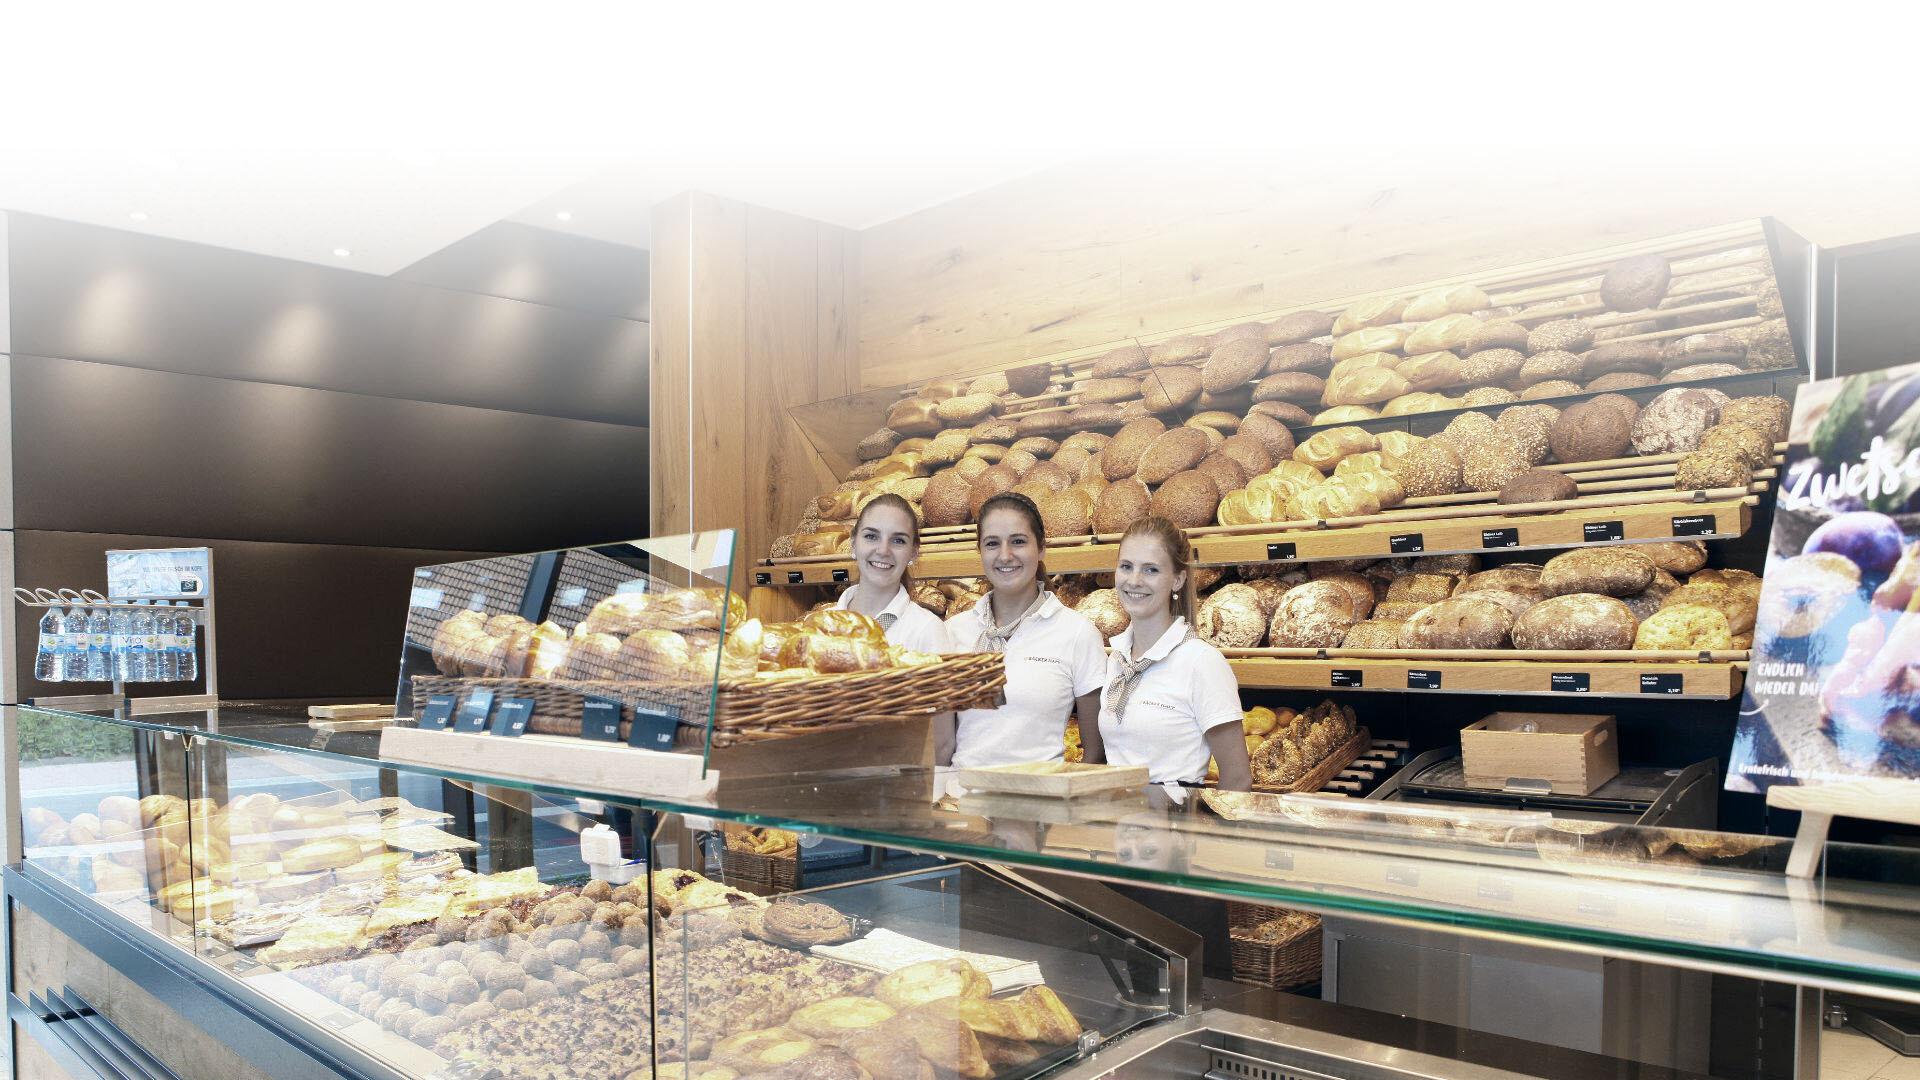 Bäckereibetrieb Happ